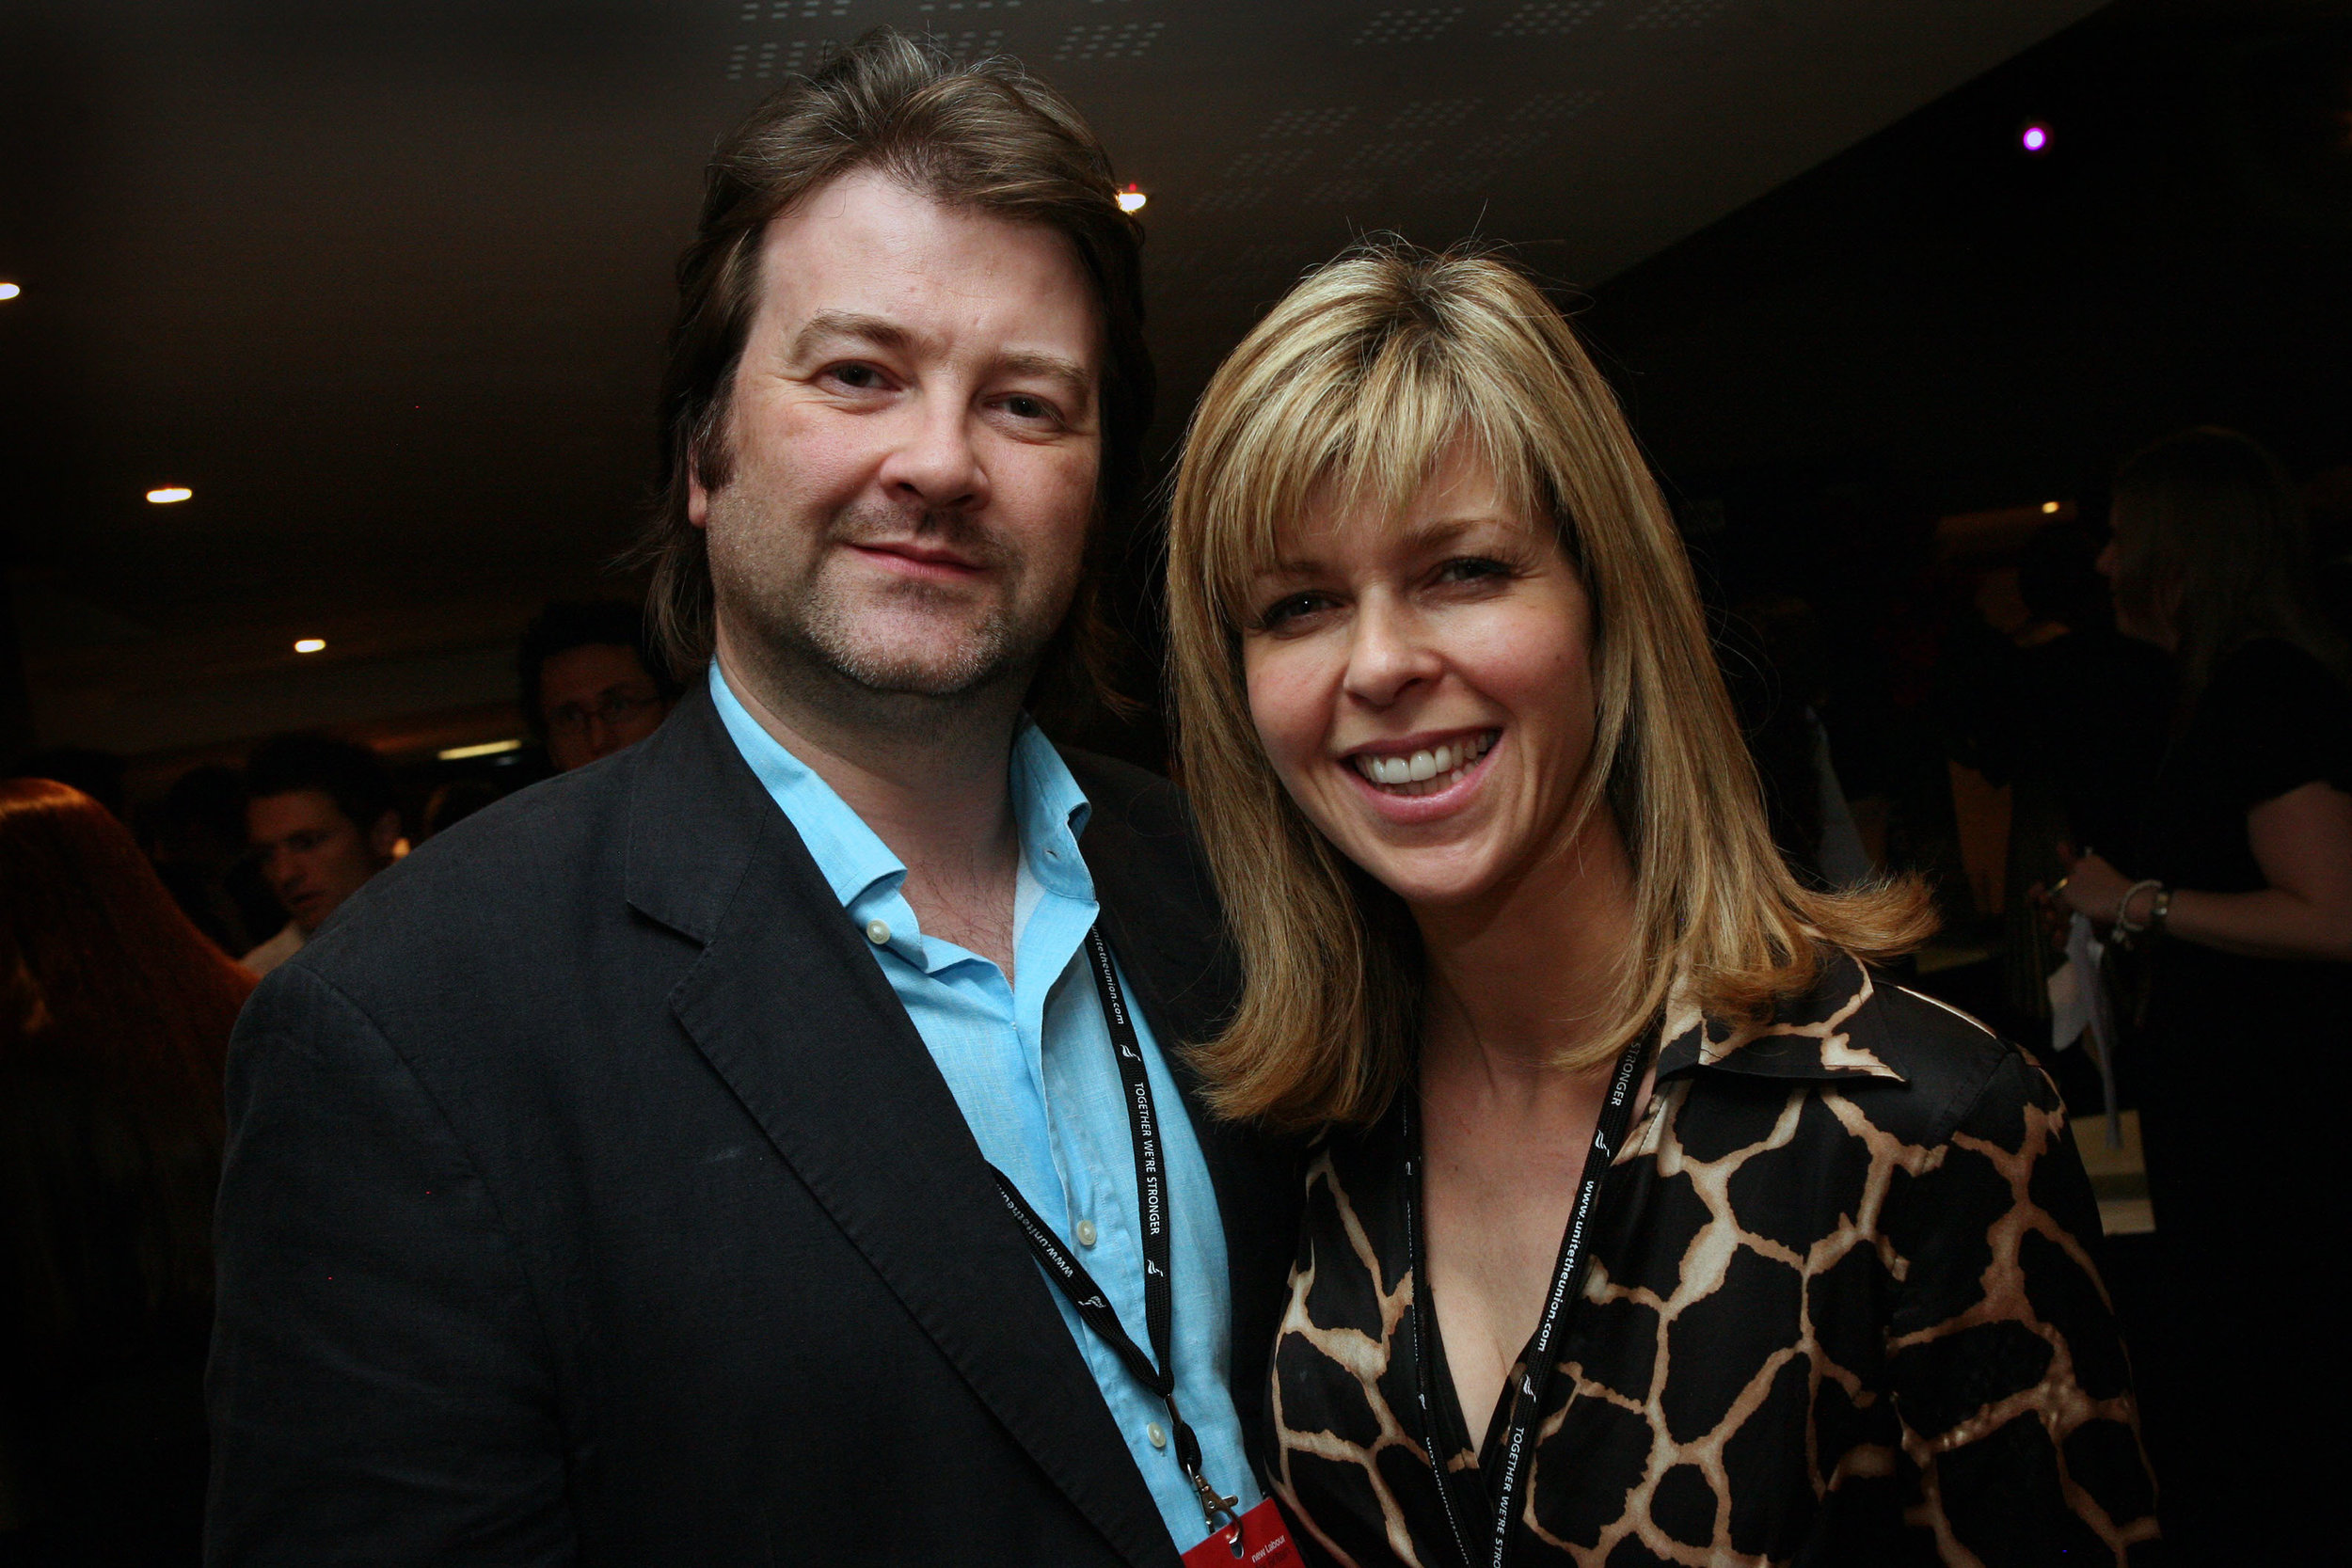 Kate with husband Derek Draper who she married in 2005